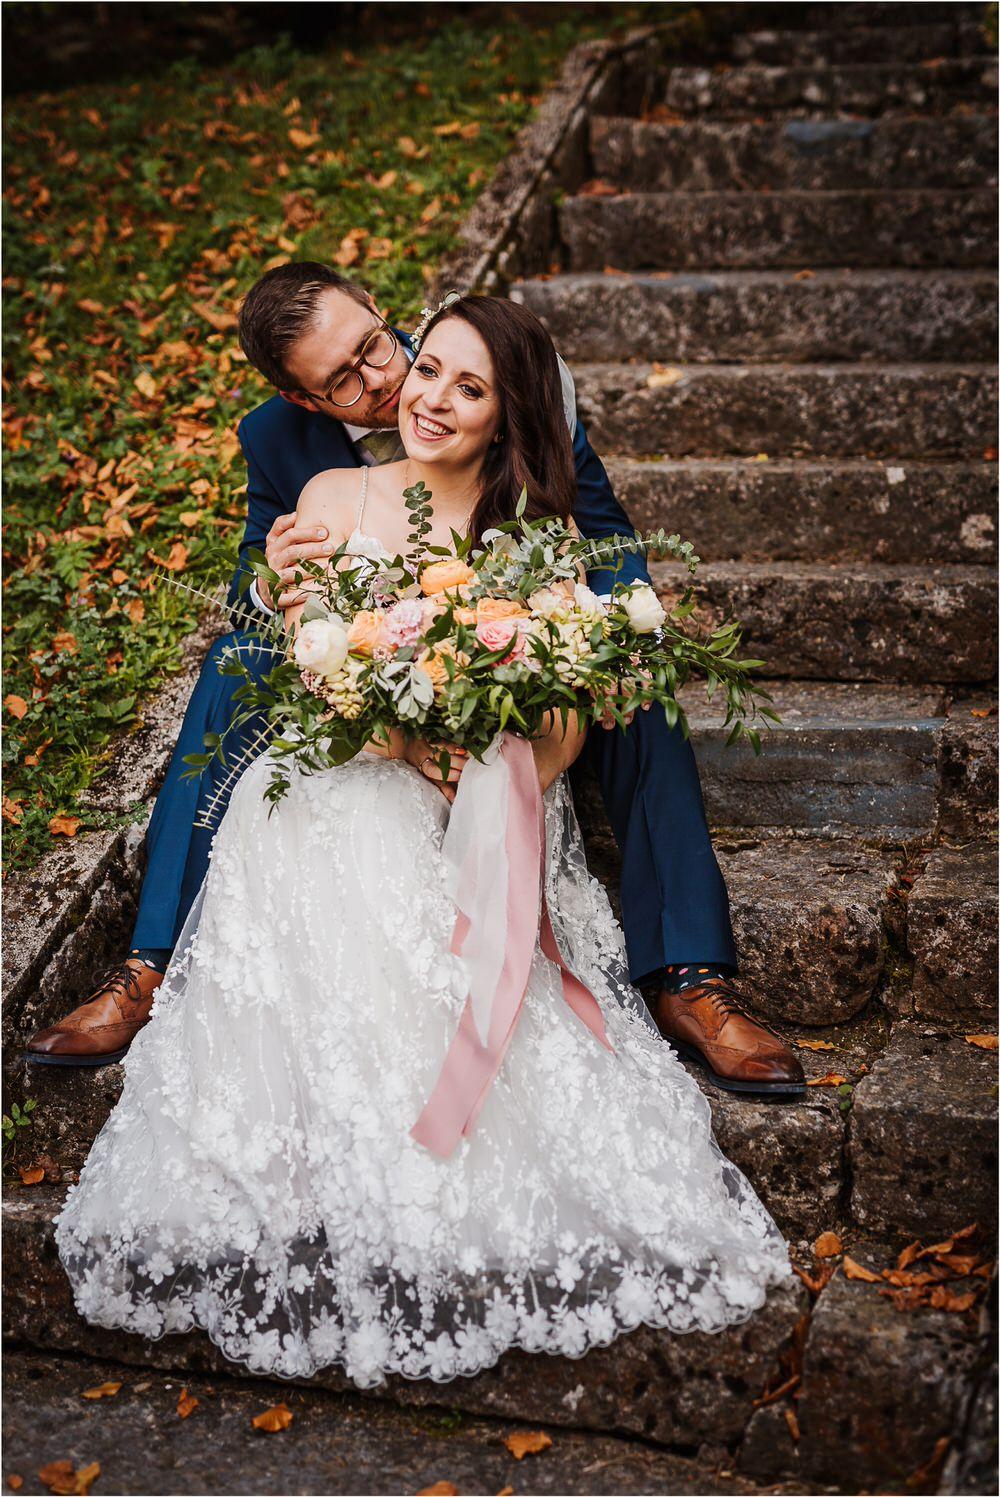 lake bled slovenia wedding vila bled sanjski sopek bled castle ceremony outdoor romantic wedding photographer photography natural candid bright 0122.jpg